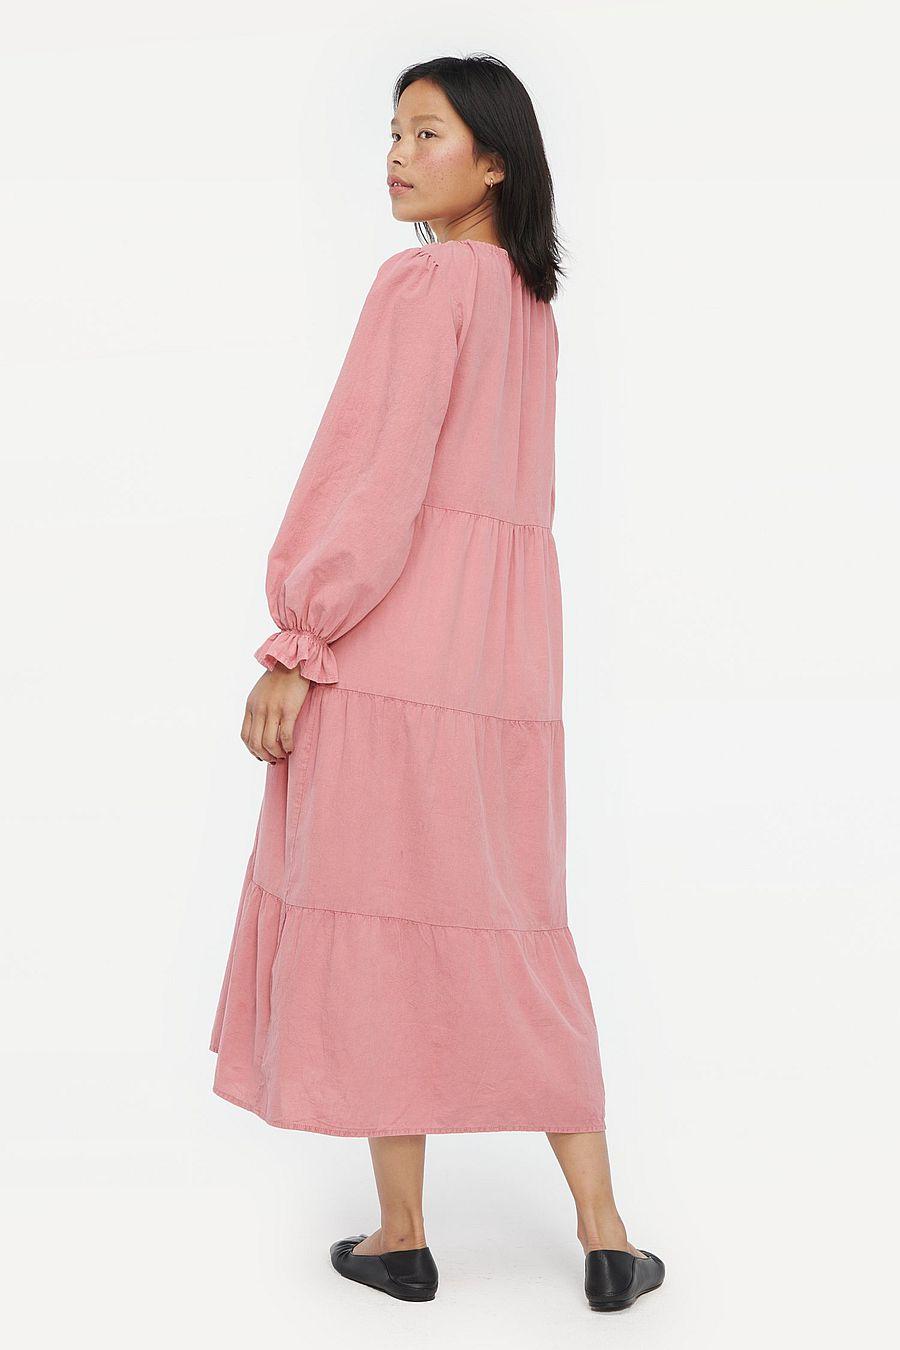 LACAUSA Clothing Tate Dress - Mesa